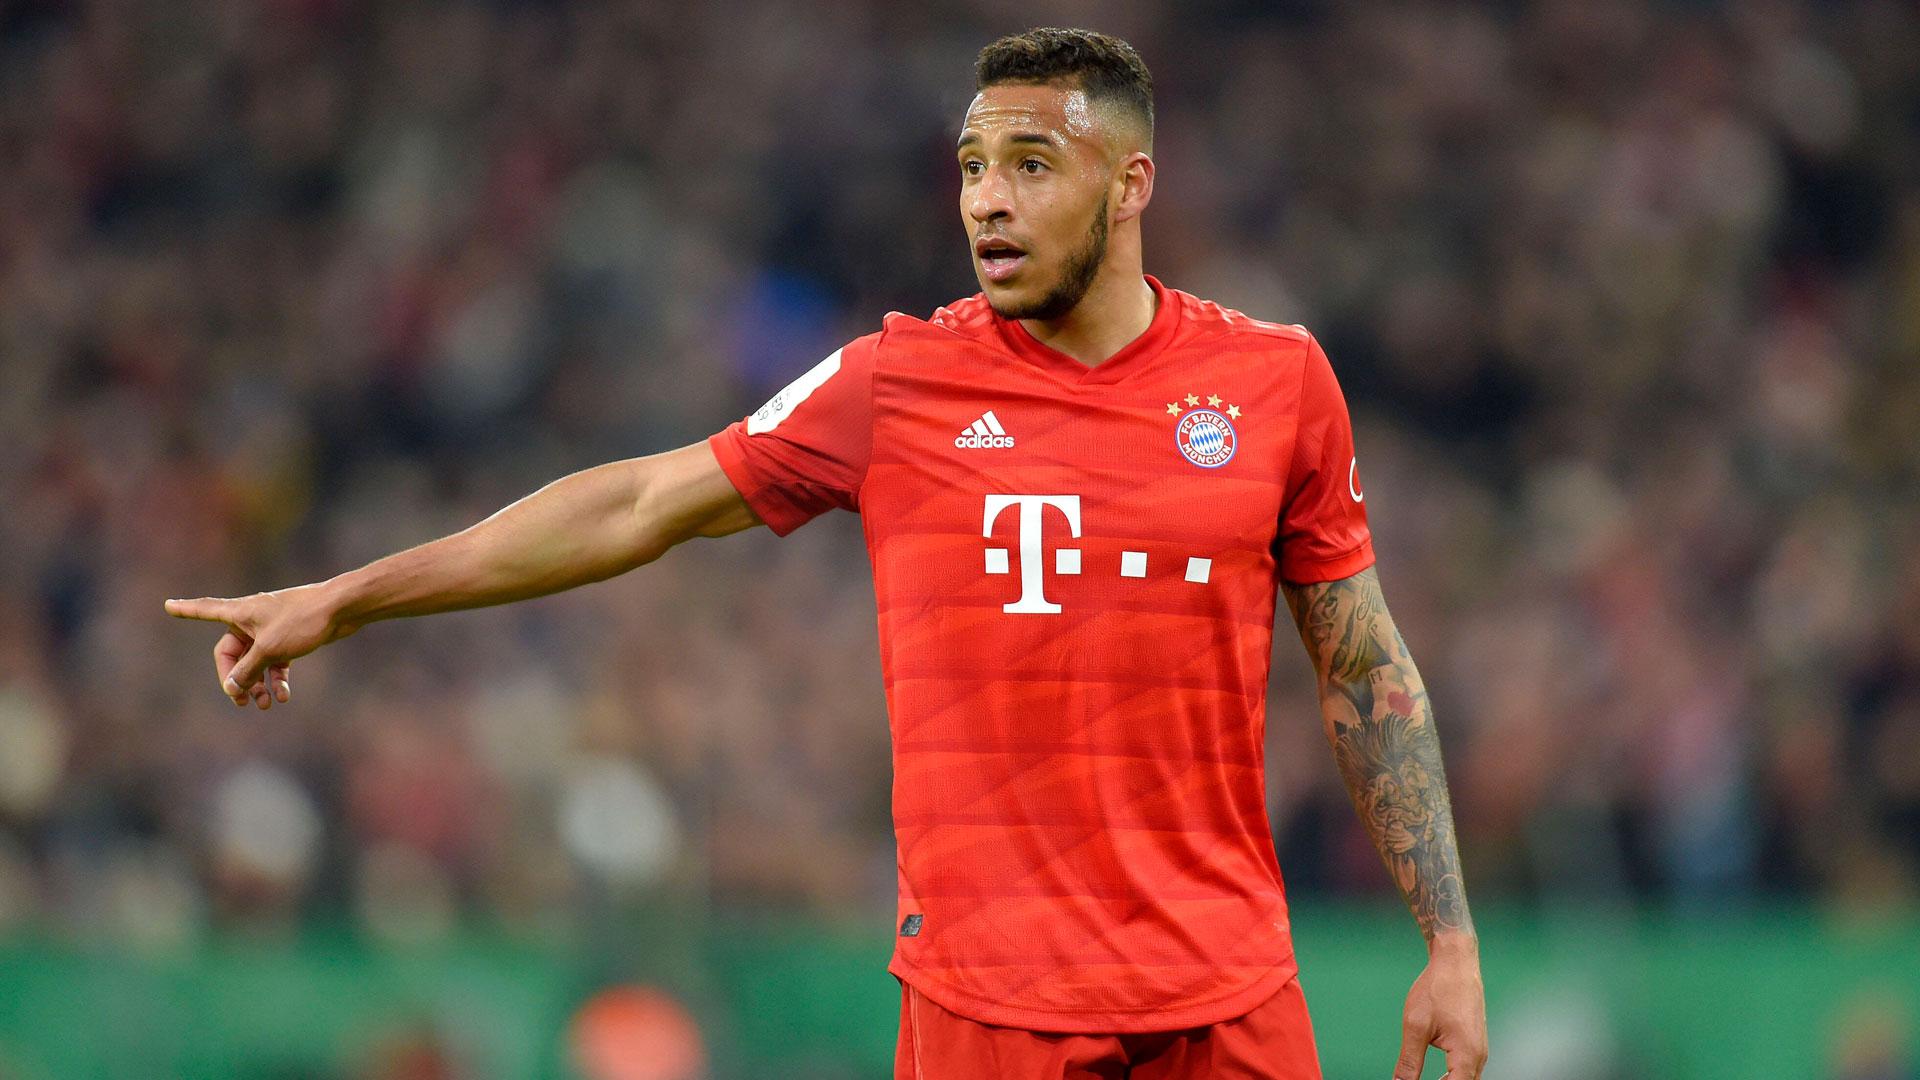 Corentin Tolisso (Credit: Bayern Munich official)